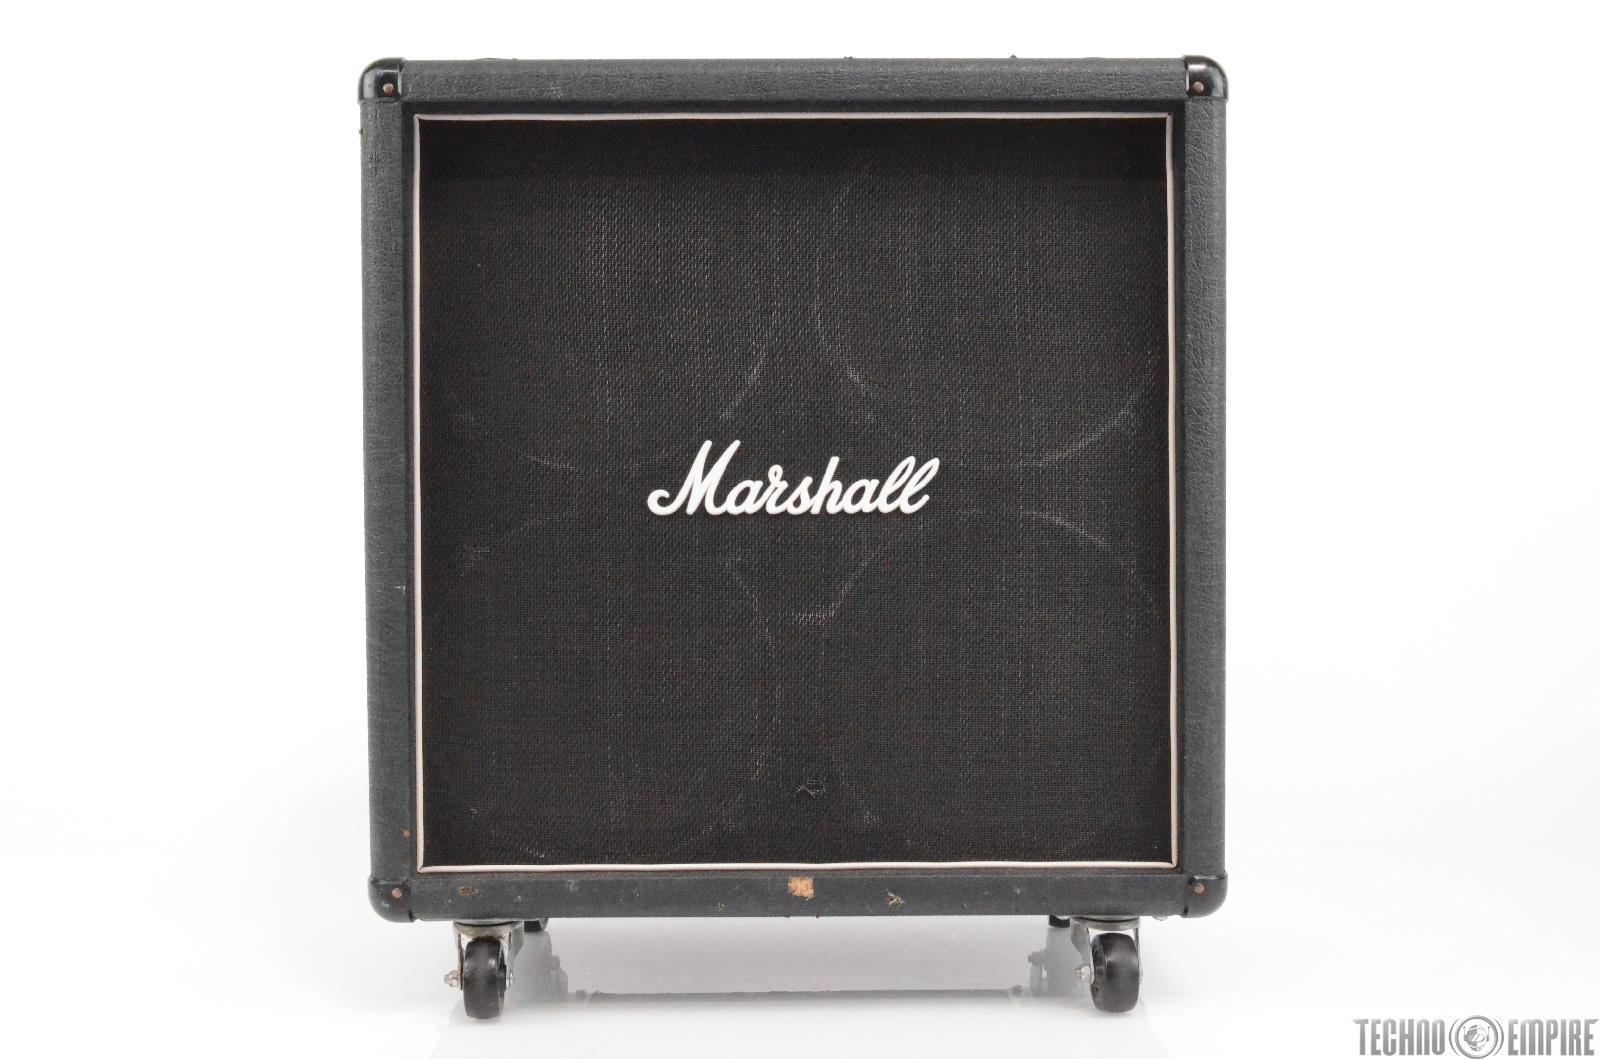 Marshall 8412 Lead Guitar Cab 4x12 Celestion Speaker Cabinet w/ Wheels #29635